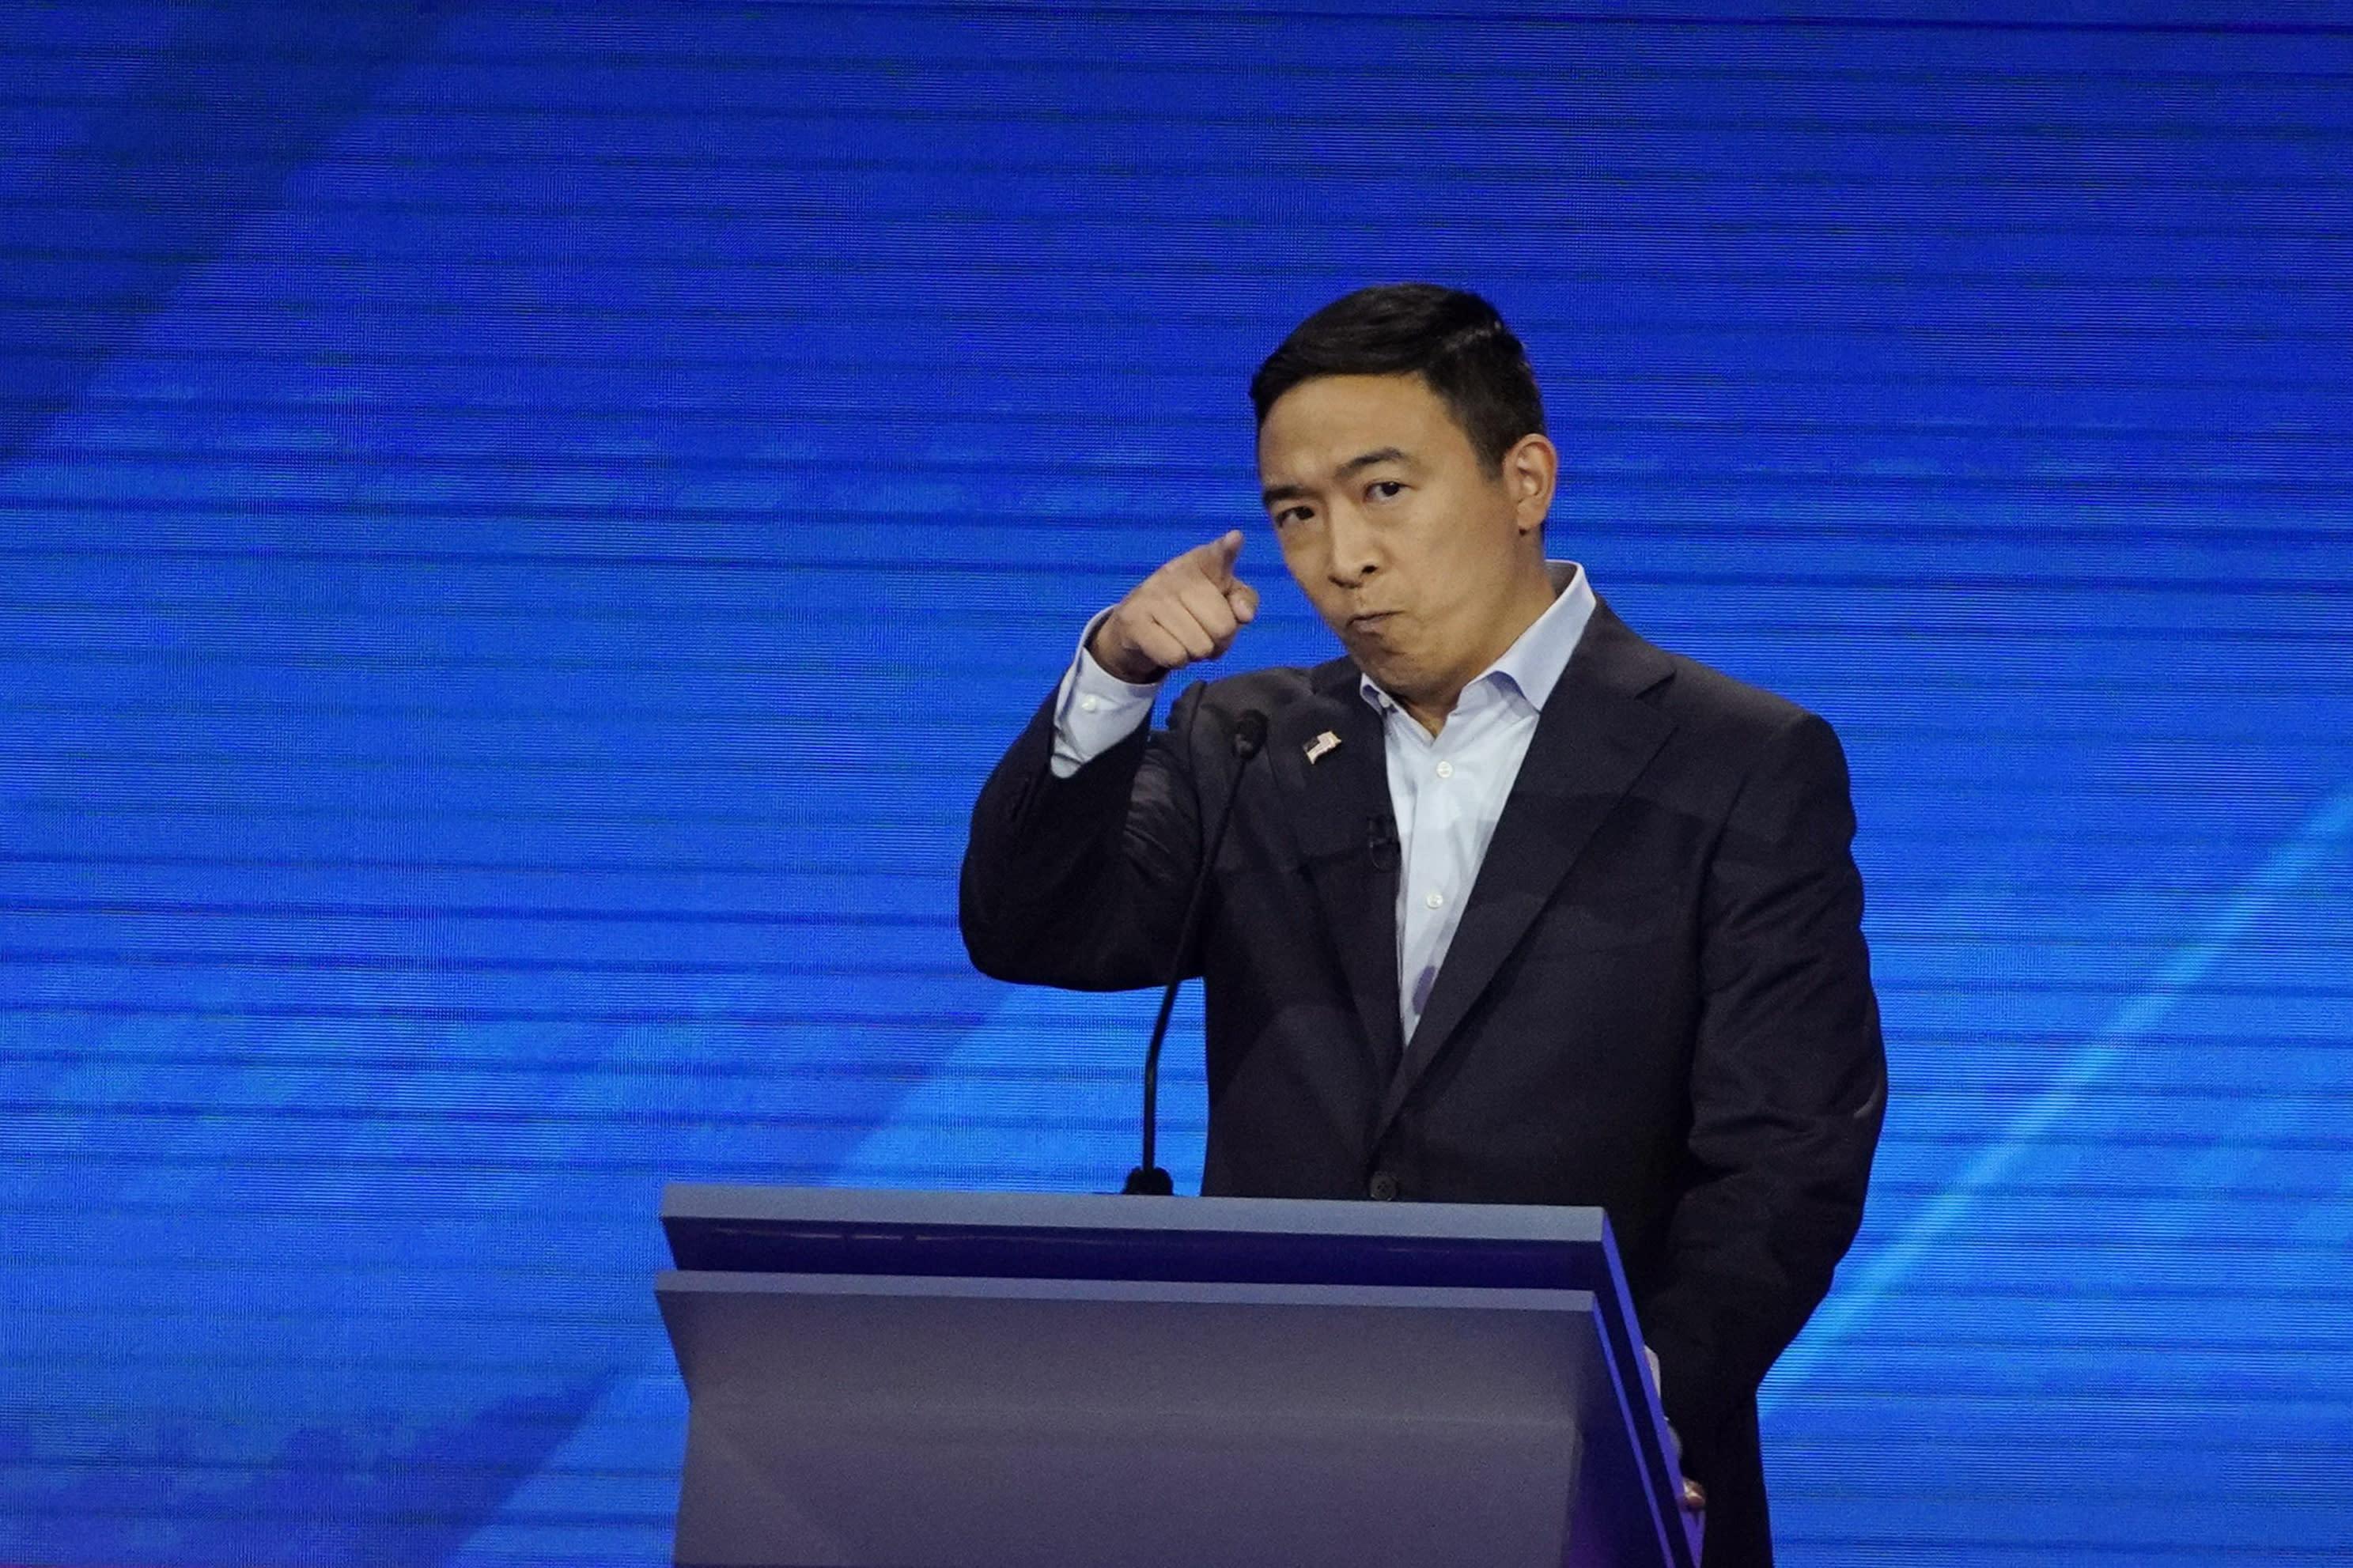 RPT-U.S. Democrats in presidential debate hint at no swift end to China tariffs